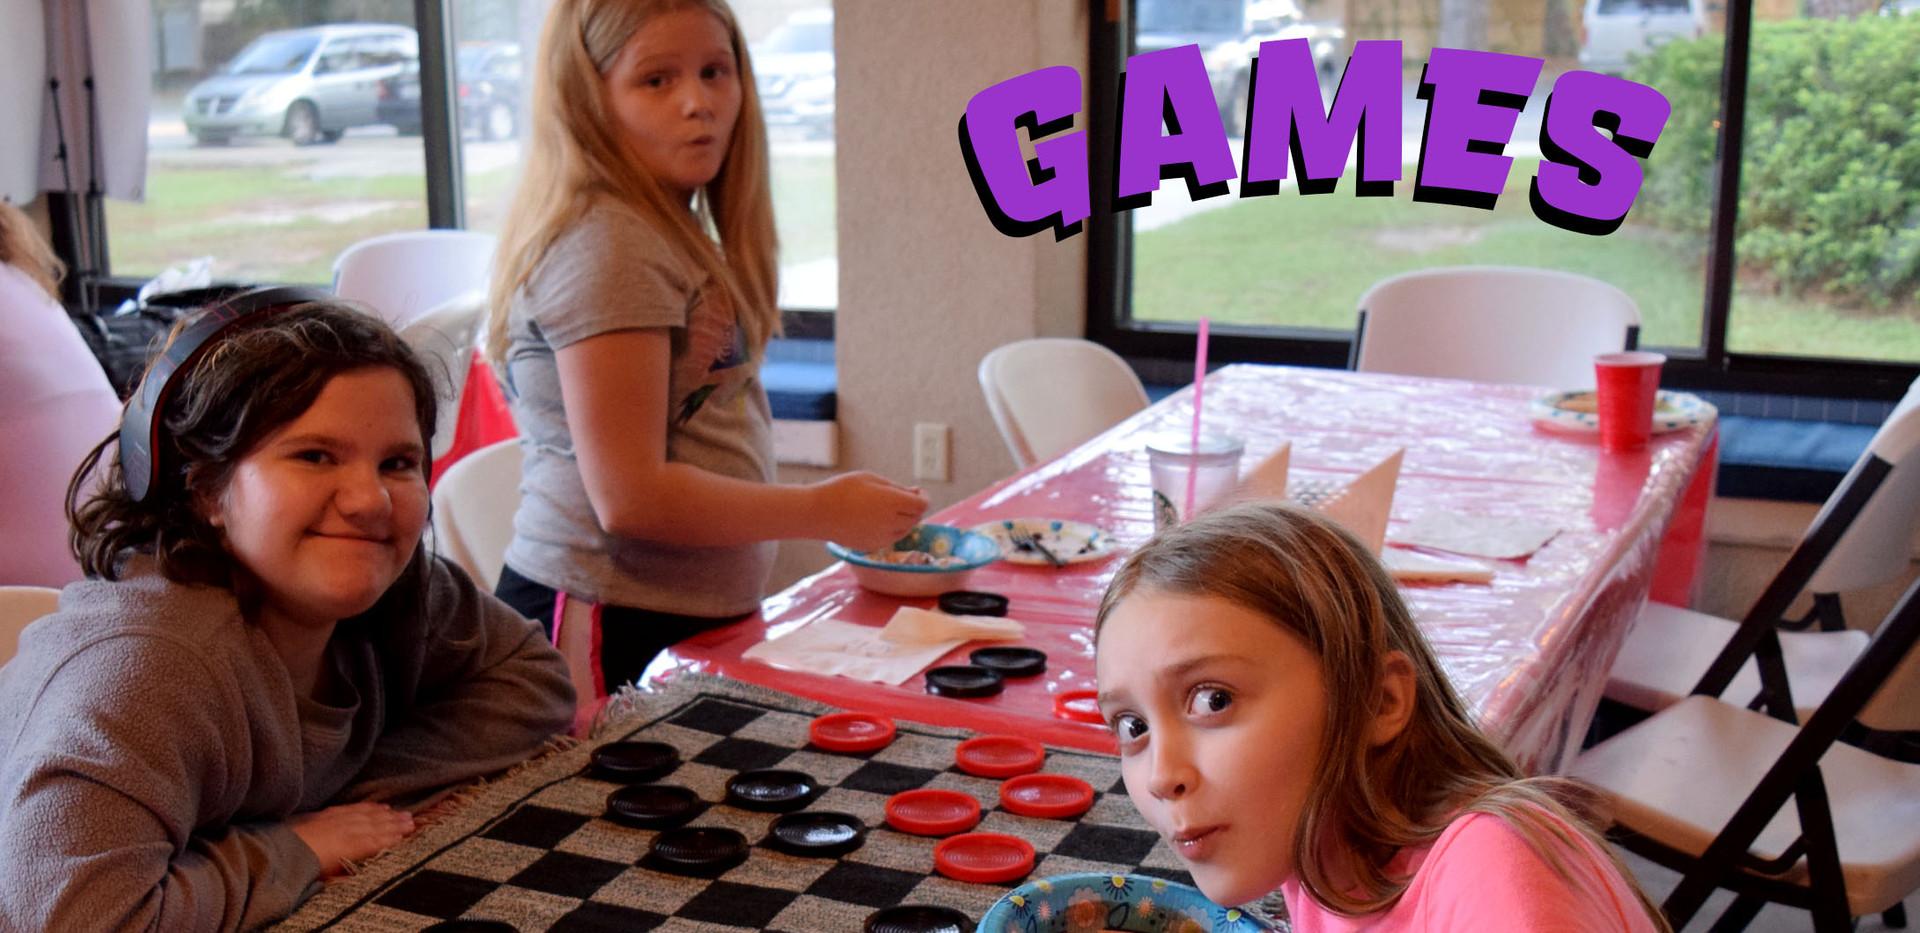 RC_games.jpg